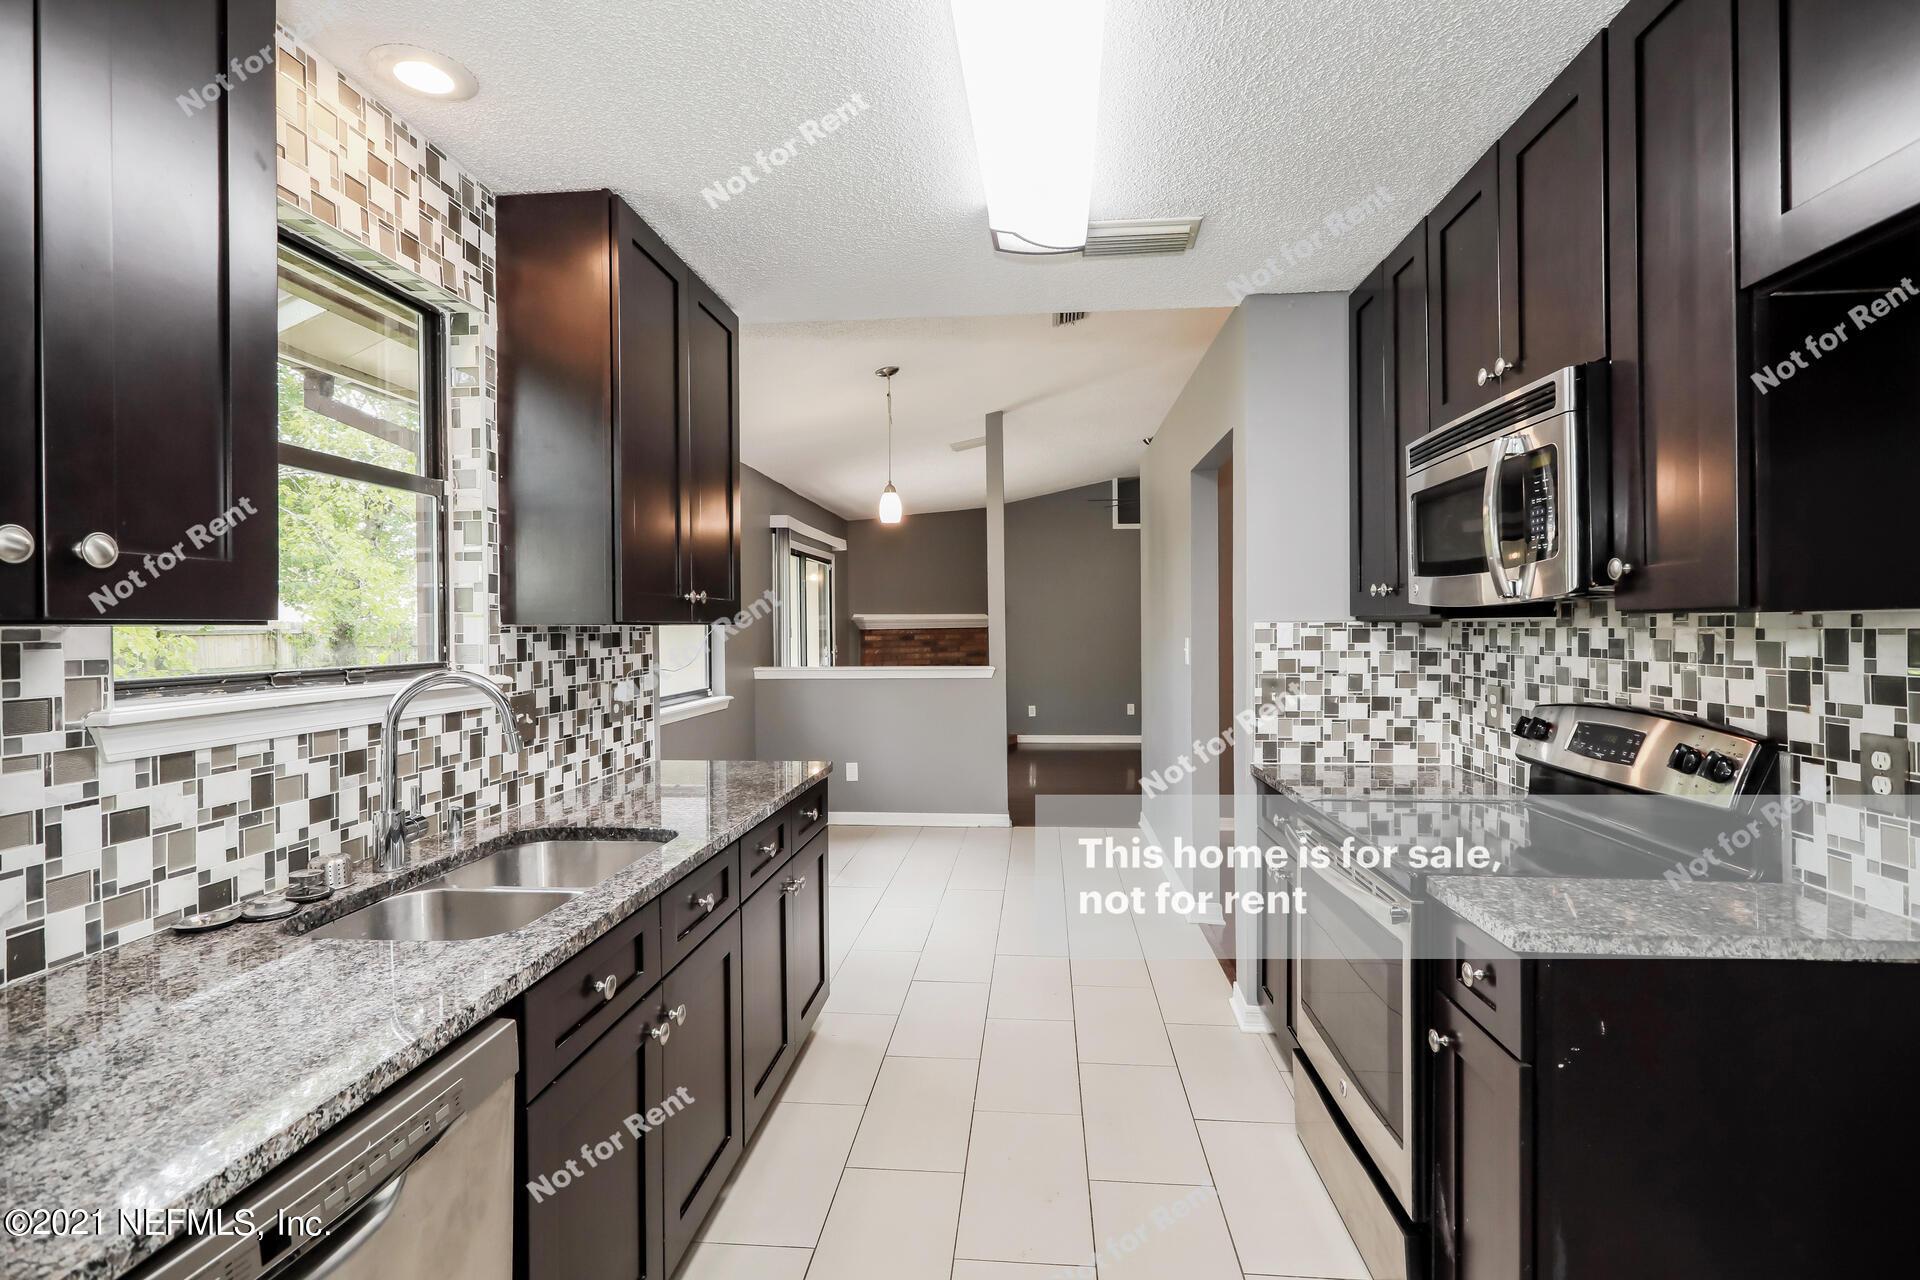 589 ROBERT LIVINGSTON, ORANGE PARK, FLORIDA 32073, 4 Bedrooms Bedrooms, ,2 BathroomsBathrooms,Residential,For sale,ROBERT LIVINGSTON,1130994